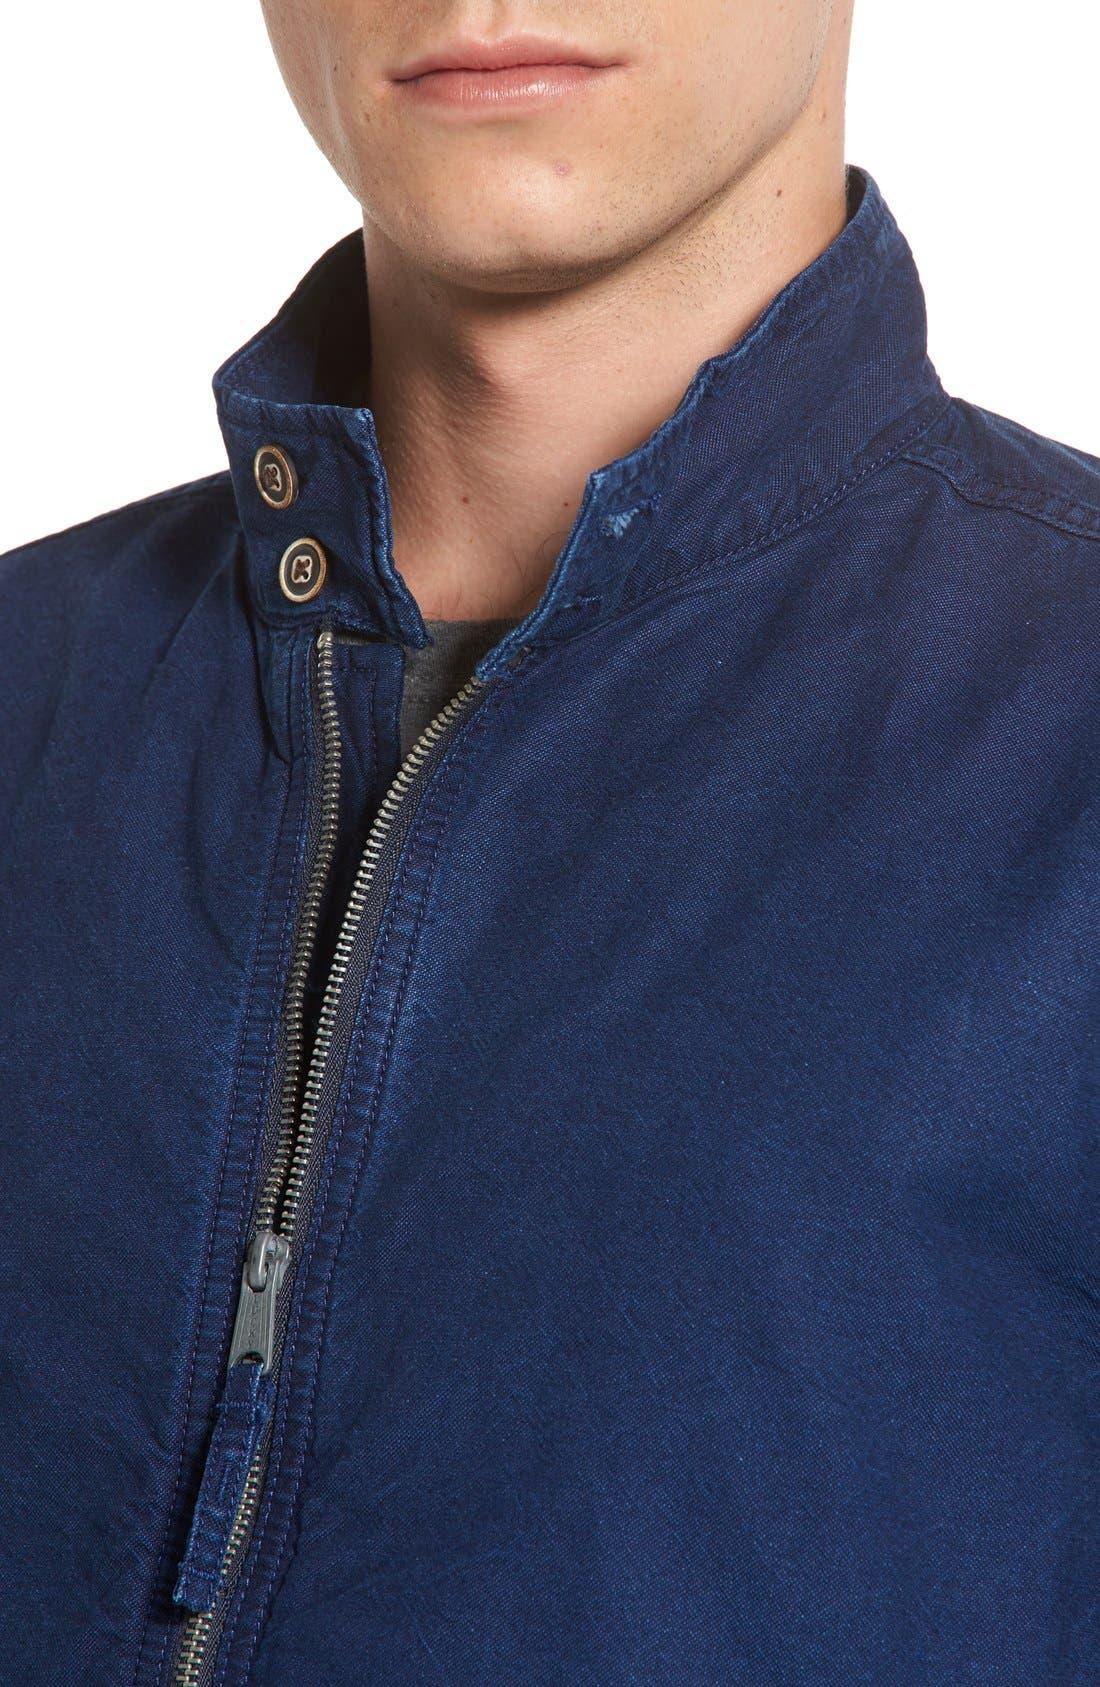 LUCKY BRAND,                             Denim Harrington Jacket,                             Alternate thumbnail 4, color,                             410